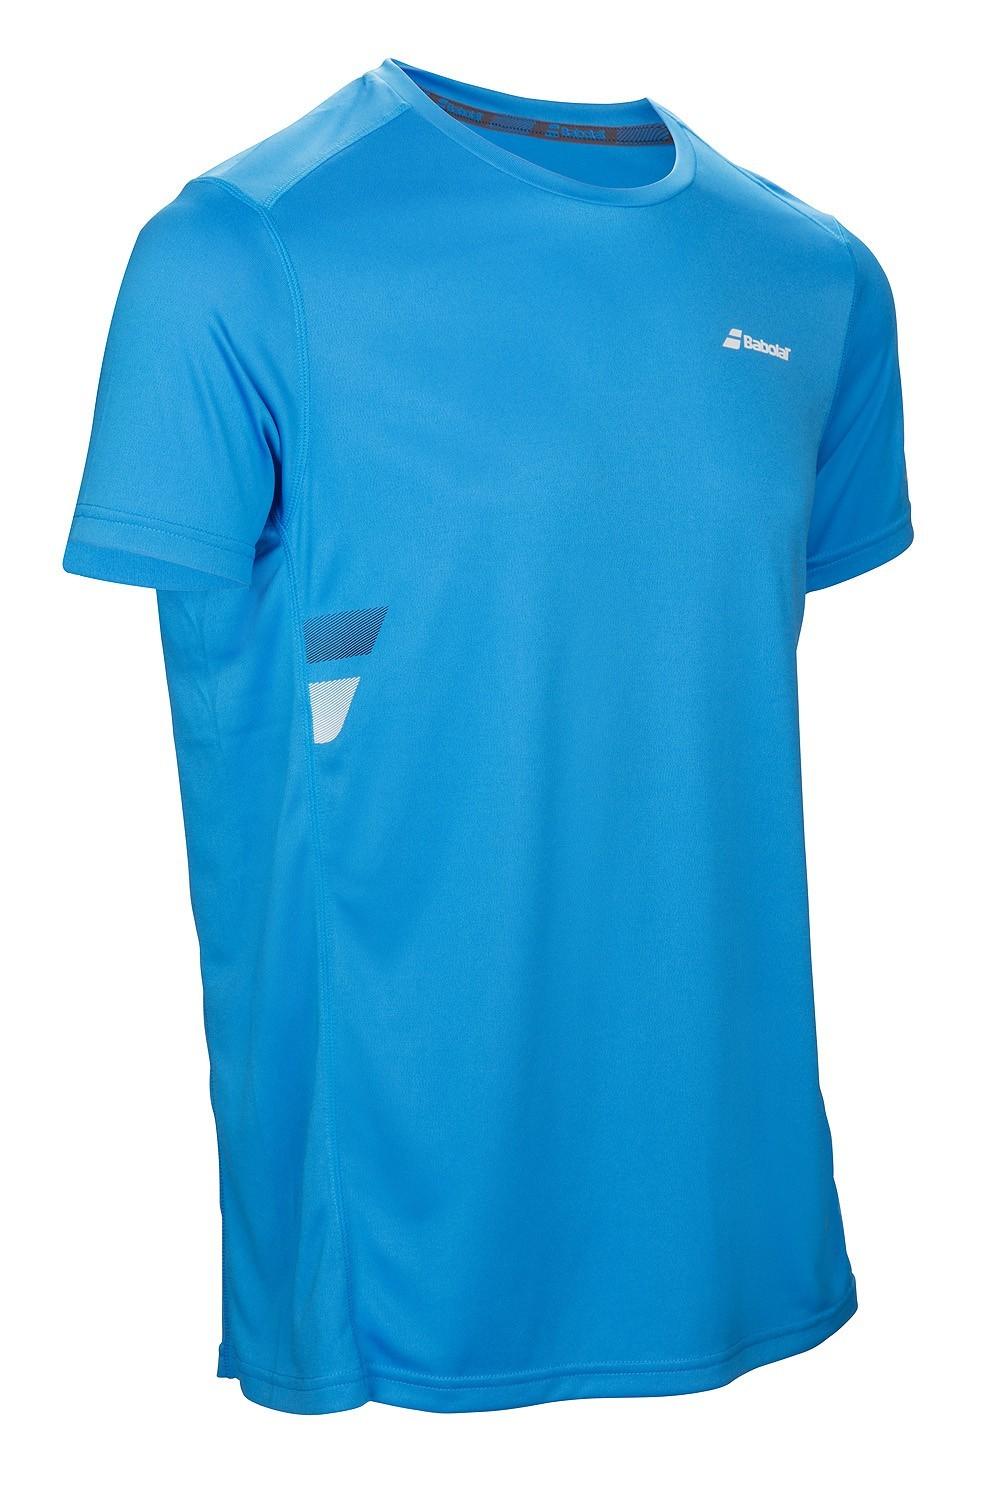 Koszulka tenisowa chłopięca Babolat Flag Core Boy Drive Blue